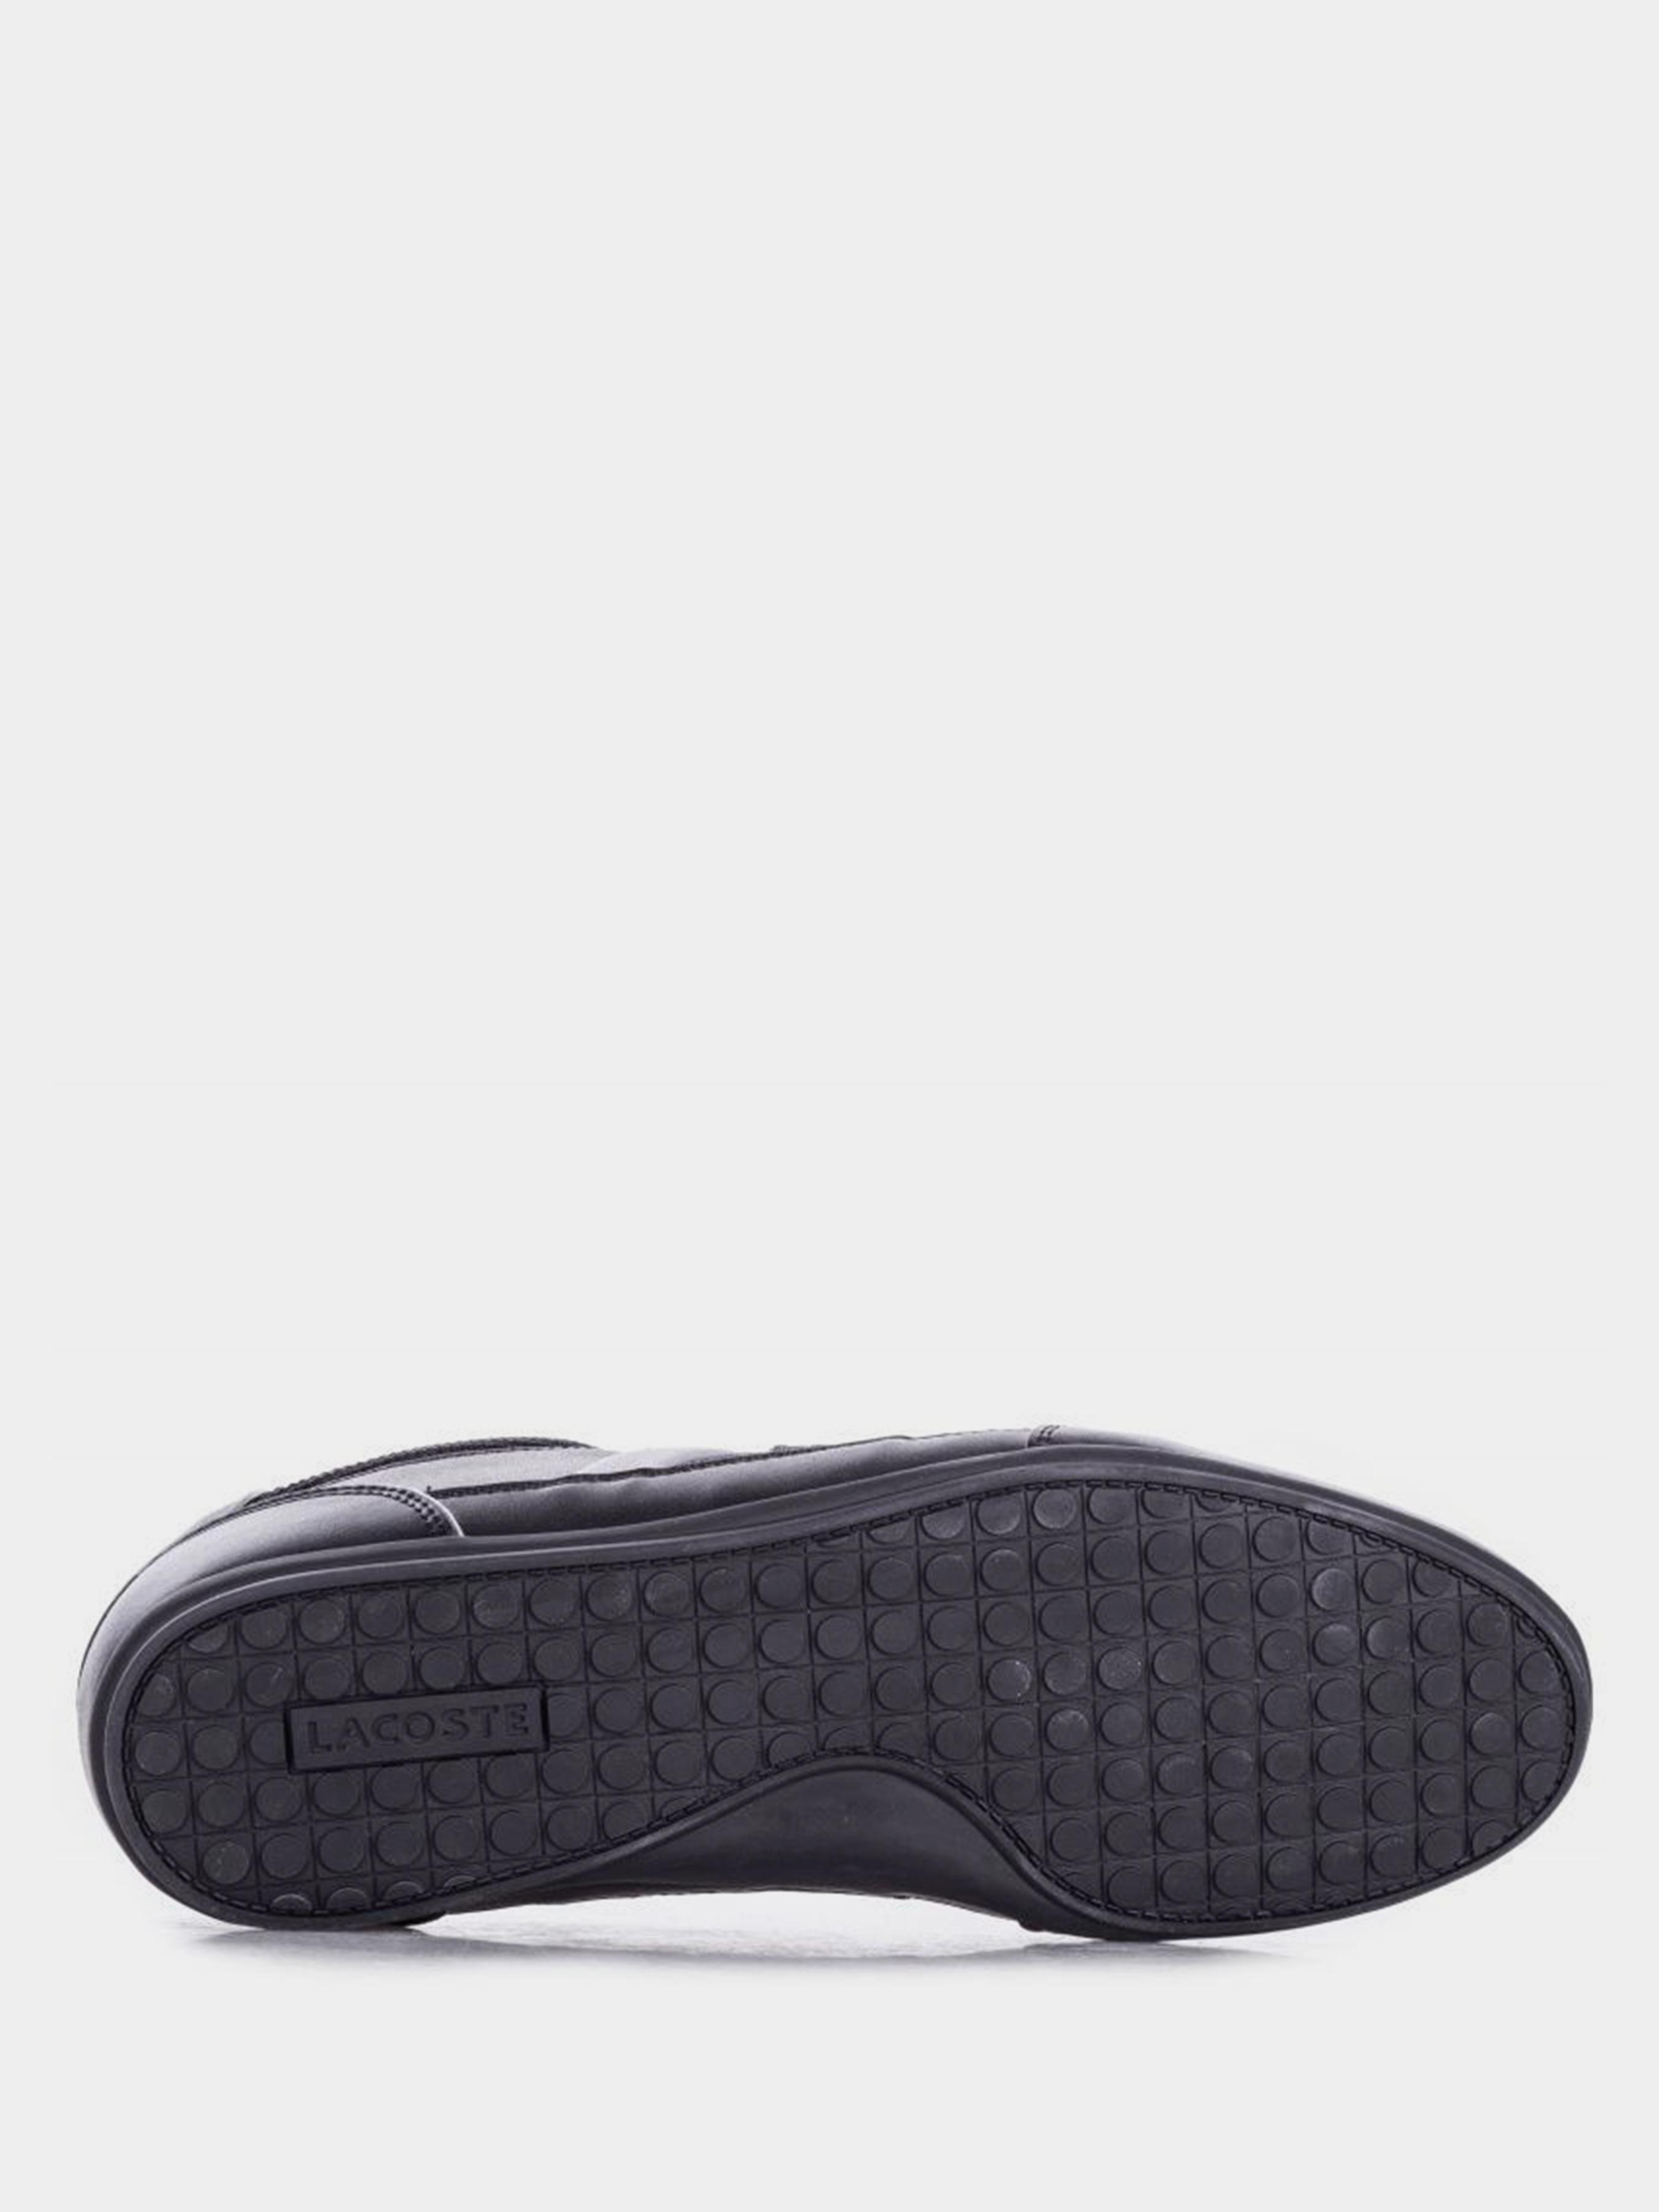 Кроссовки мужские Lacoste CHAYMON LK179 размеры обуви, 2017